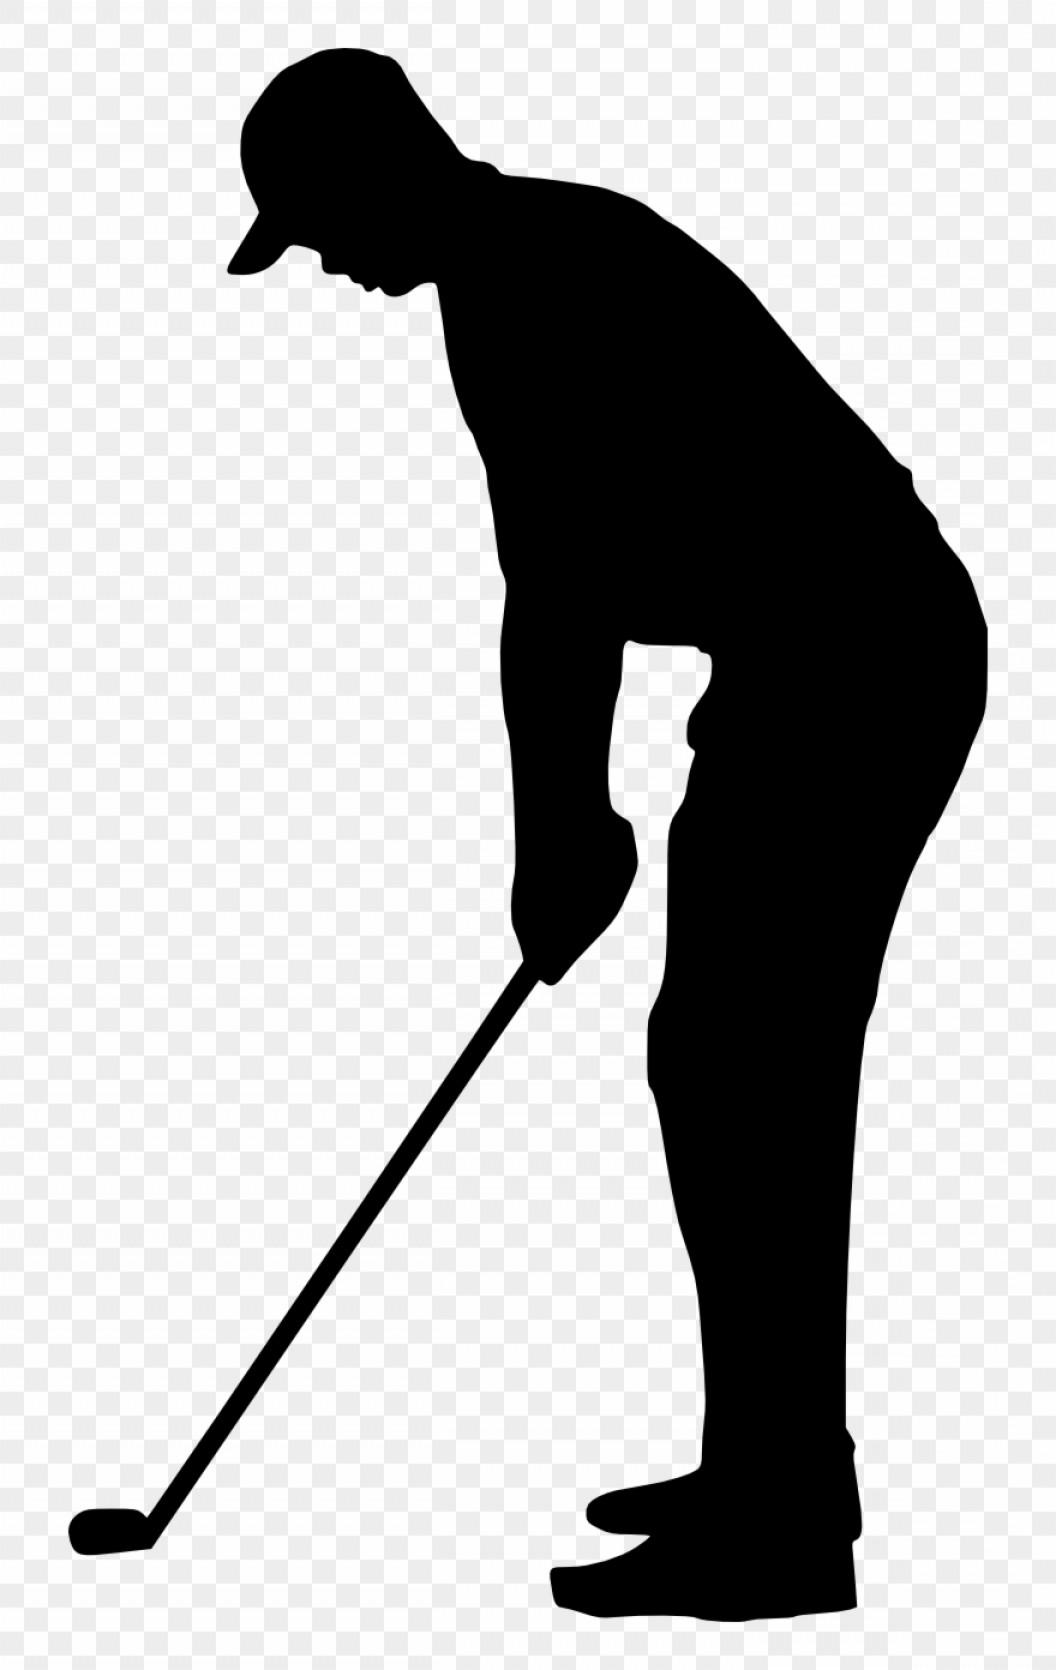 Golfing clipart retro sport. Ixtwwhgolfing transparent background